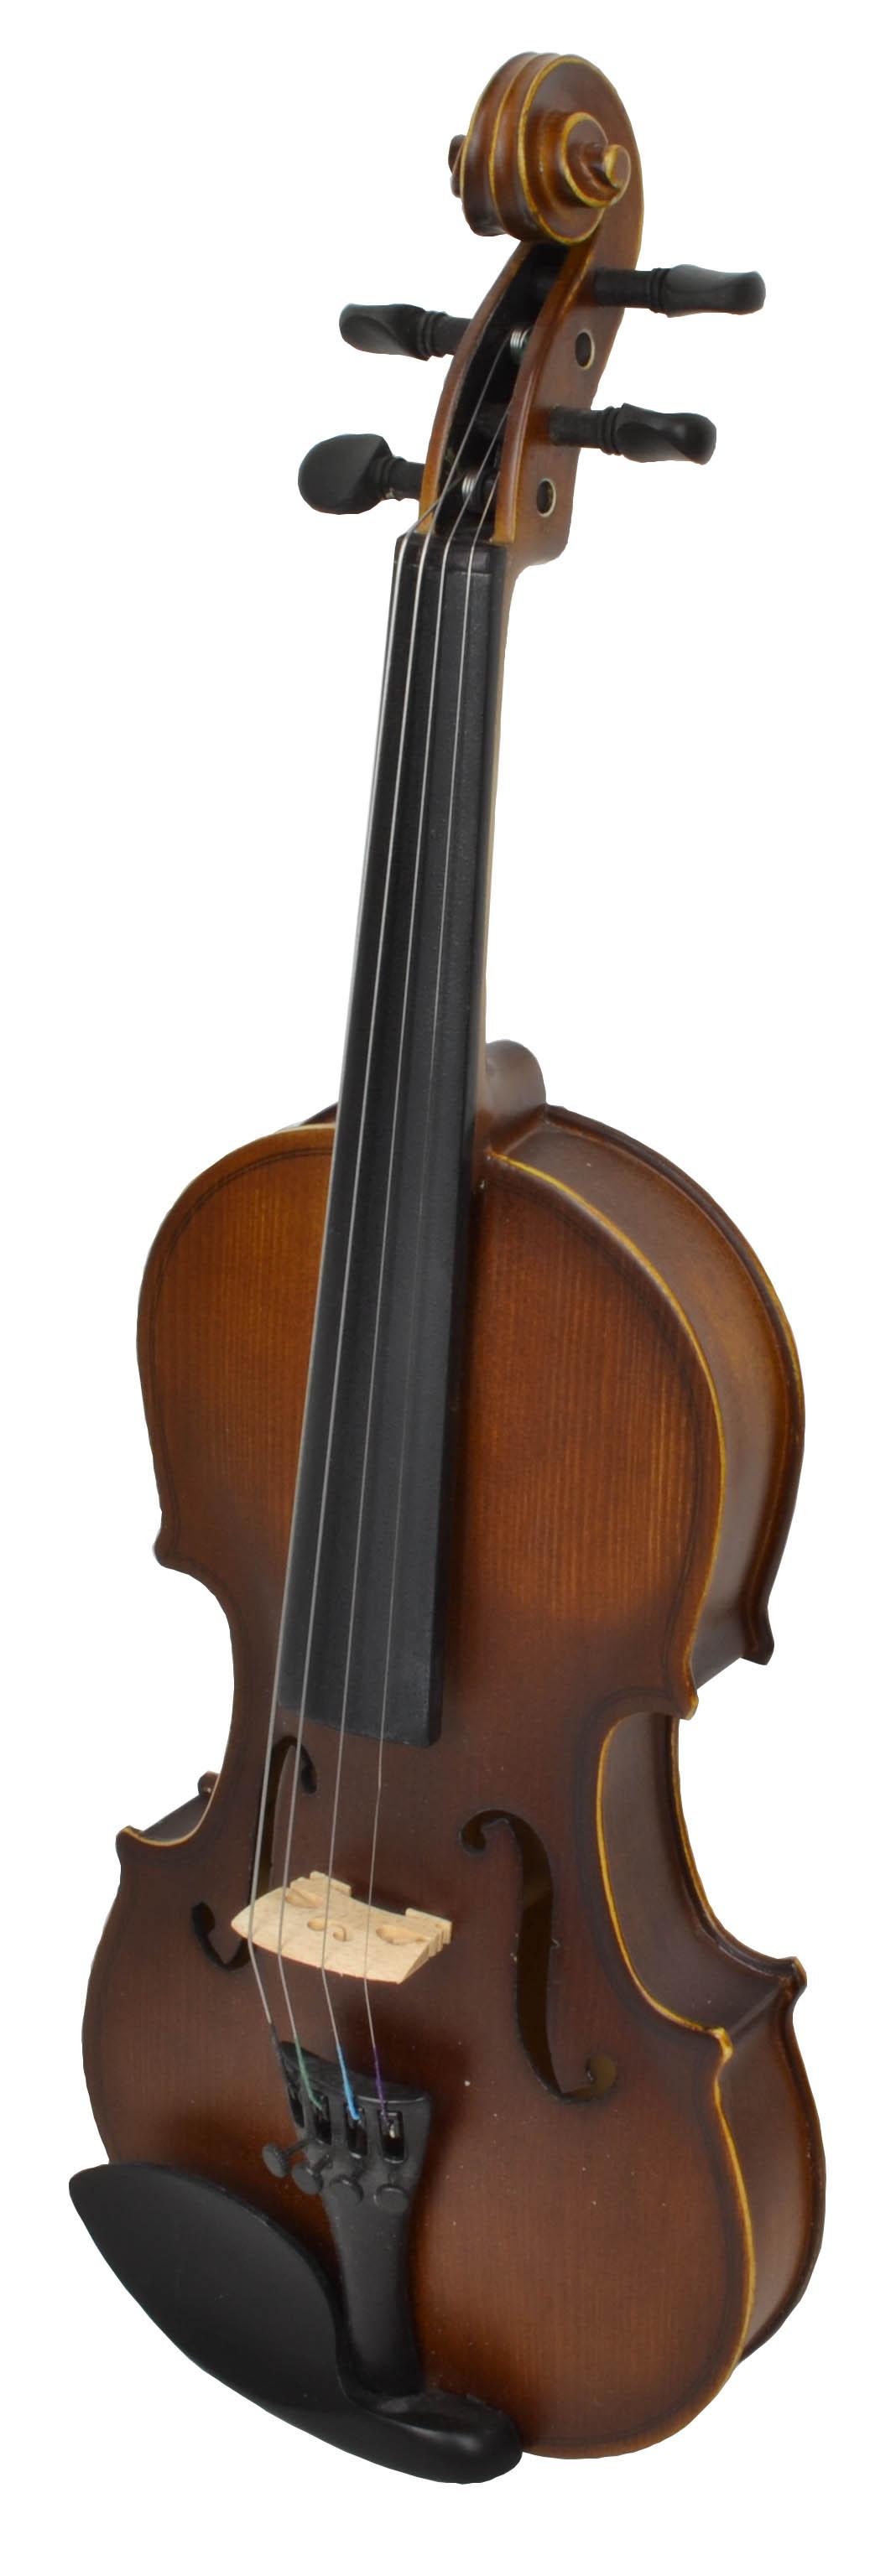 student violin 1 8 size and case by sotendo violin. Black Bedroom Furniture Sets. Home Design Ideas